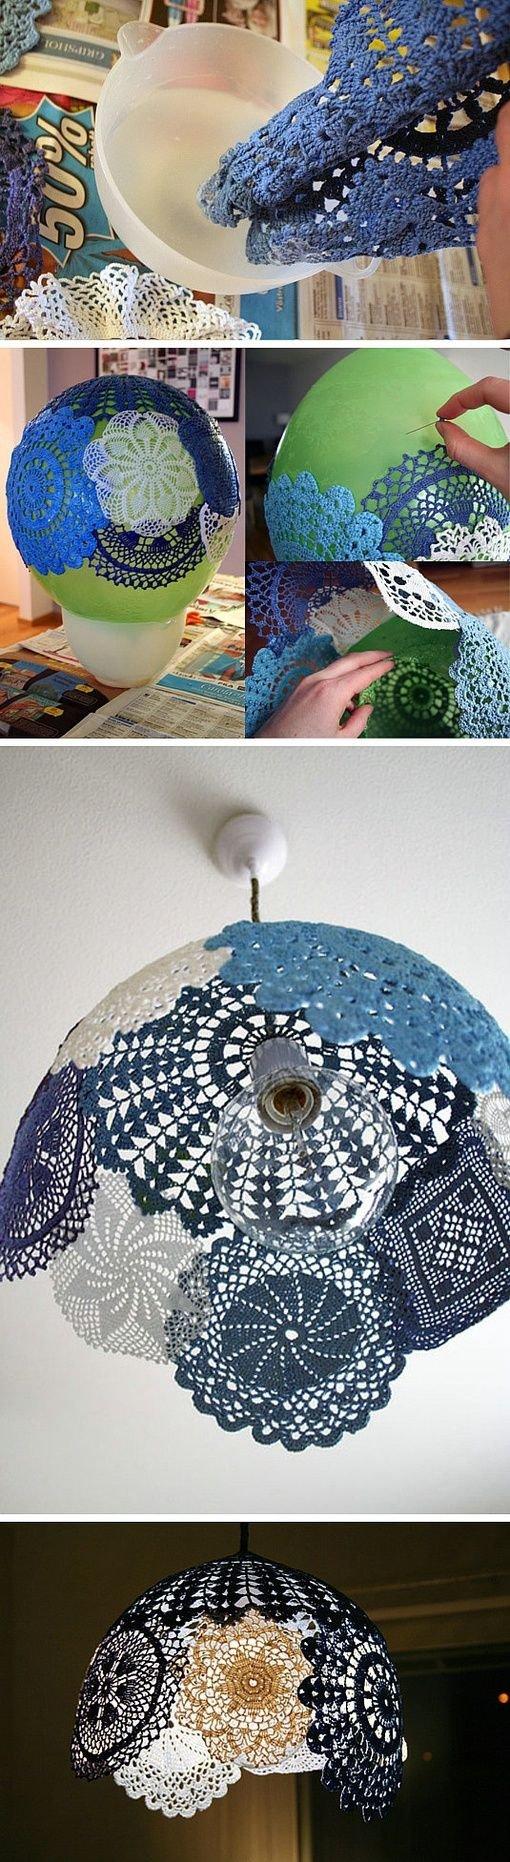 Make a Cool Lampshade